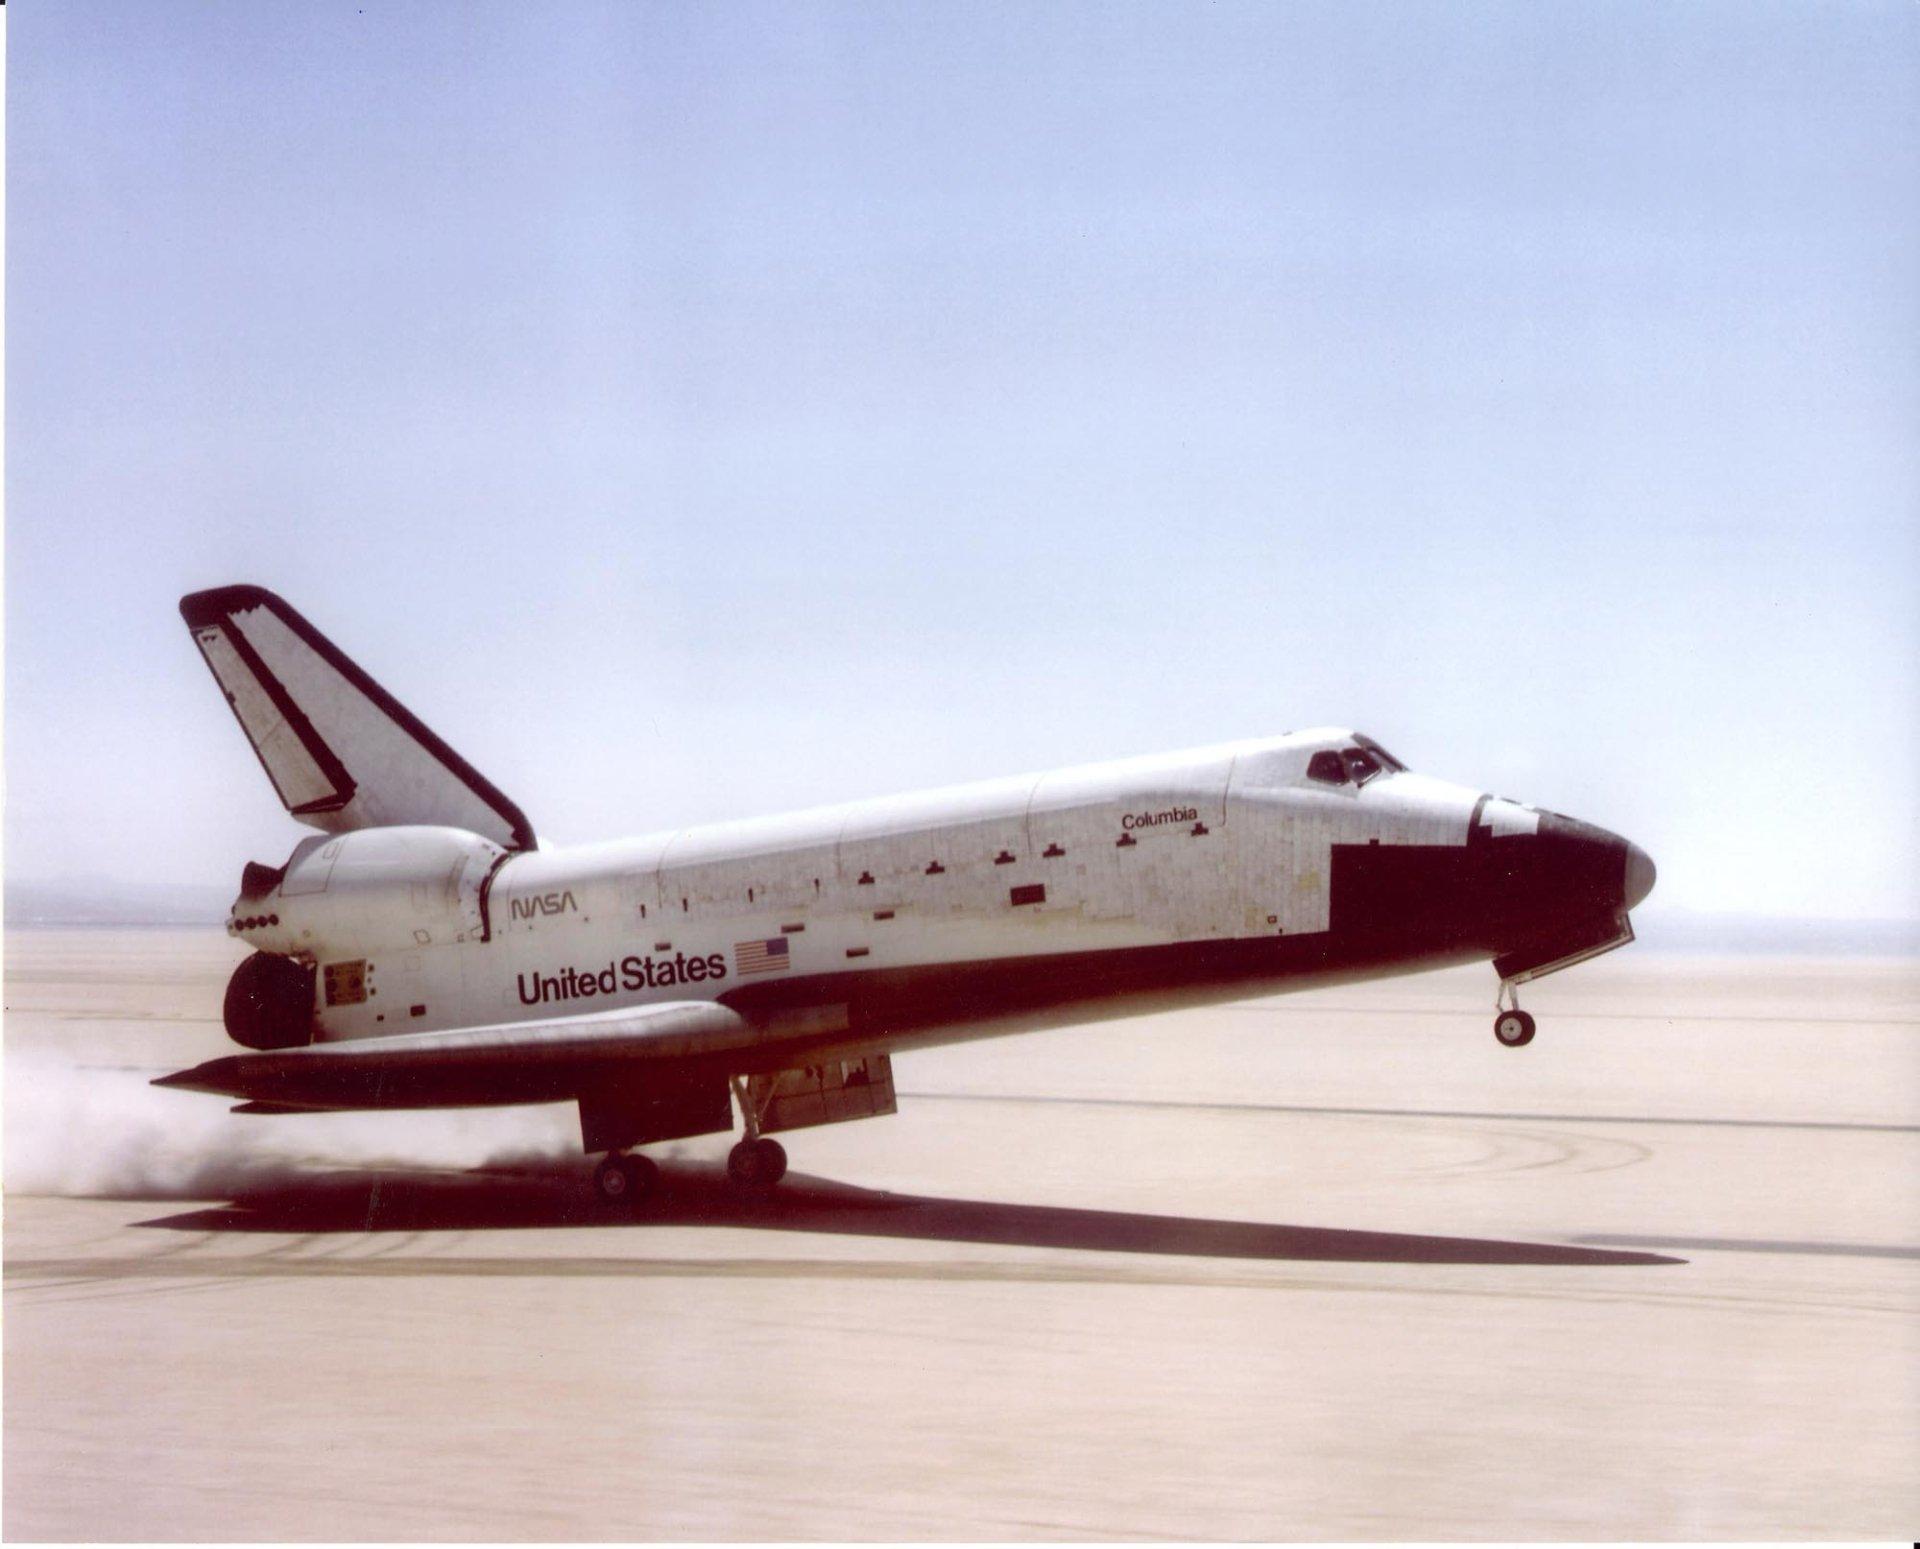 space shuttle columbia wallpaper - photo #22